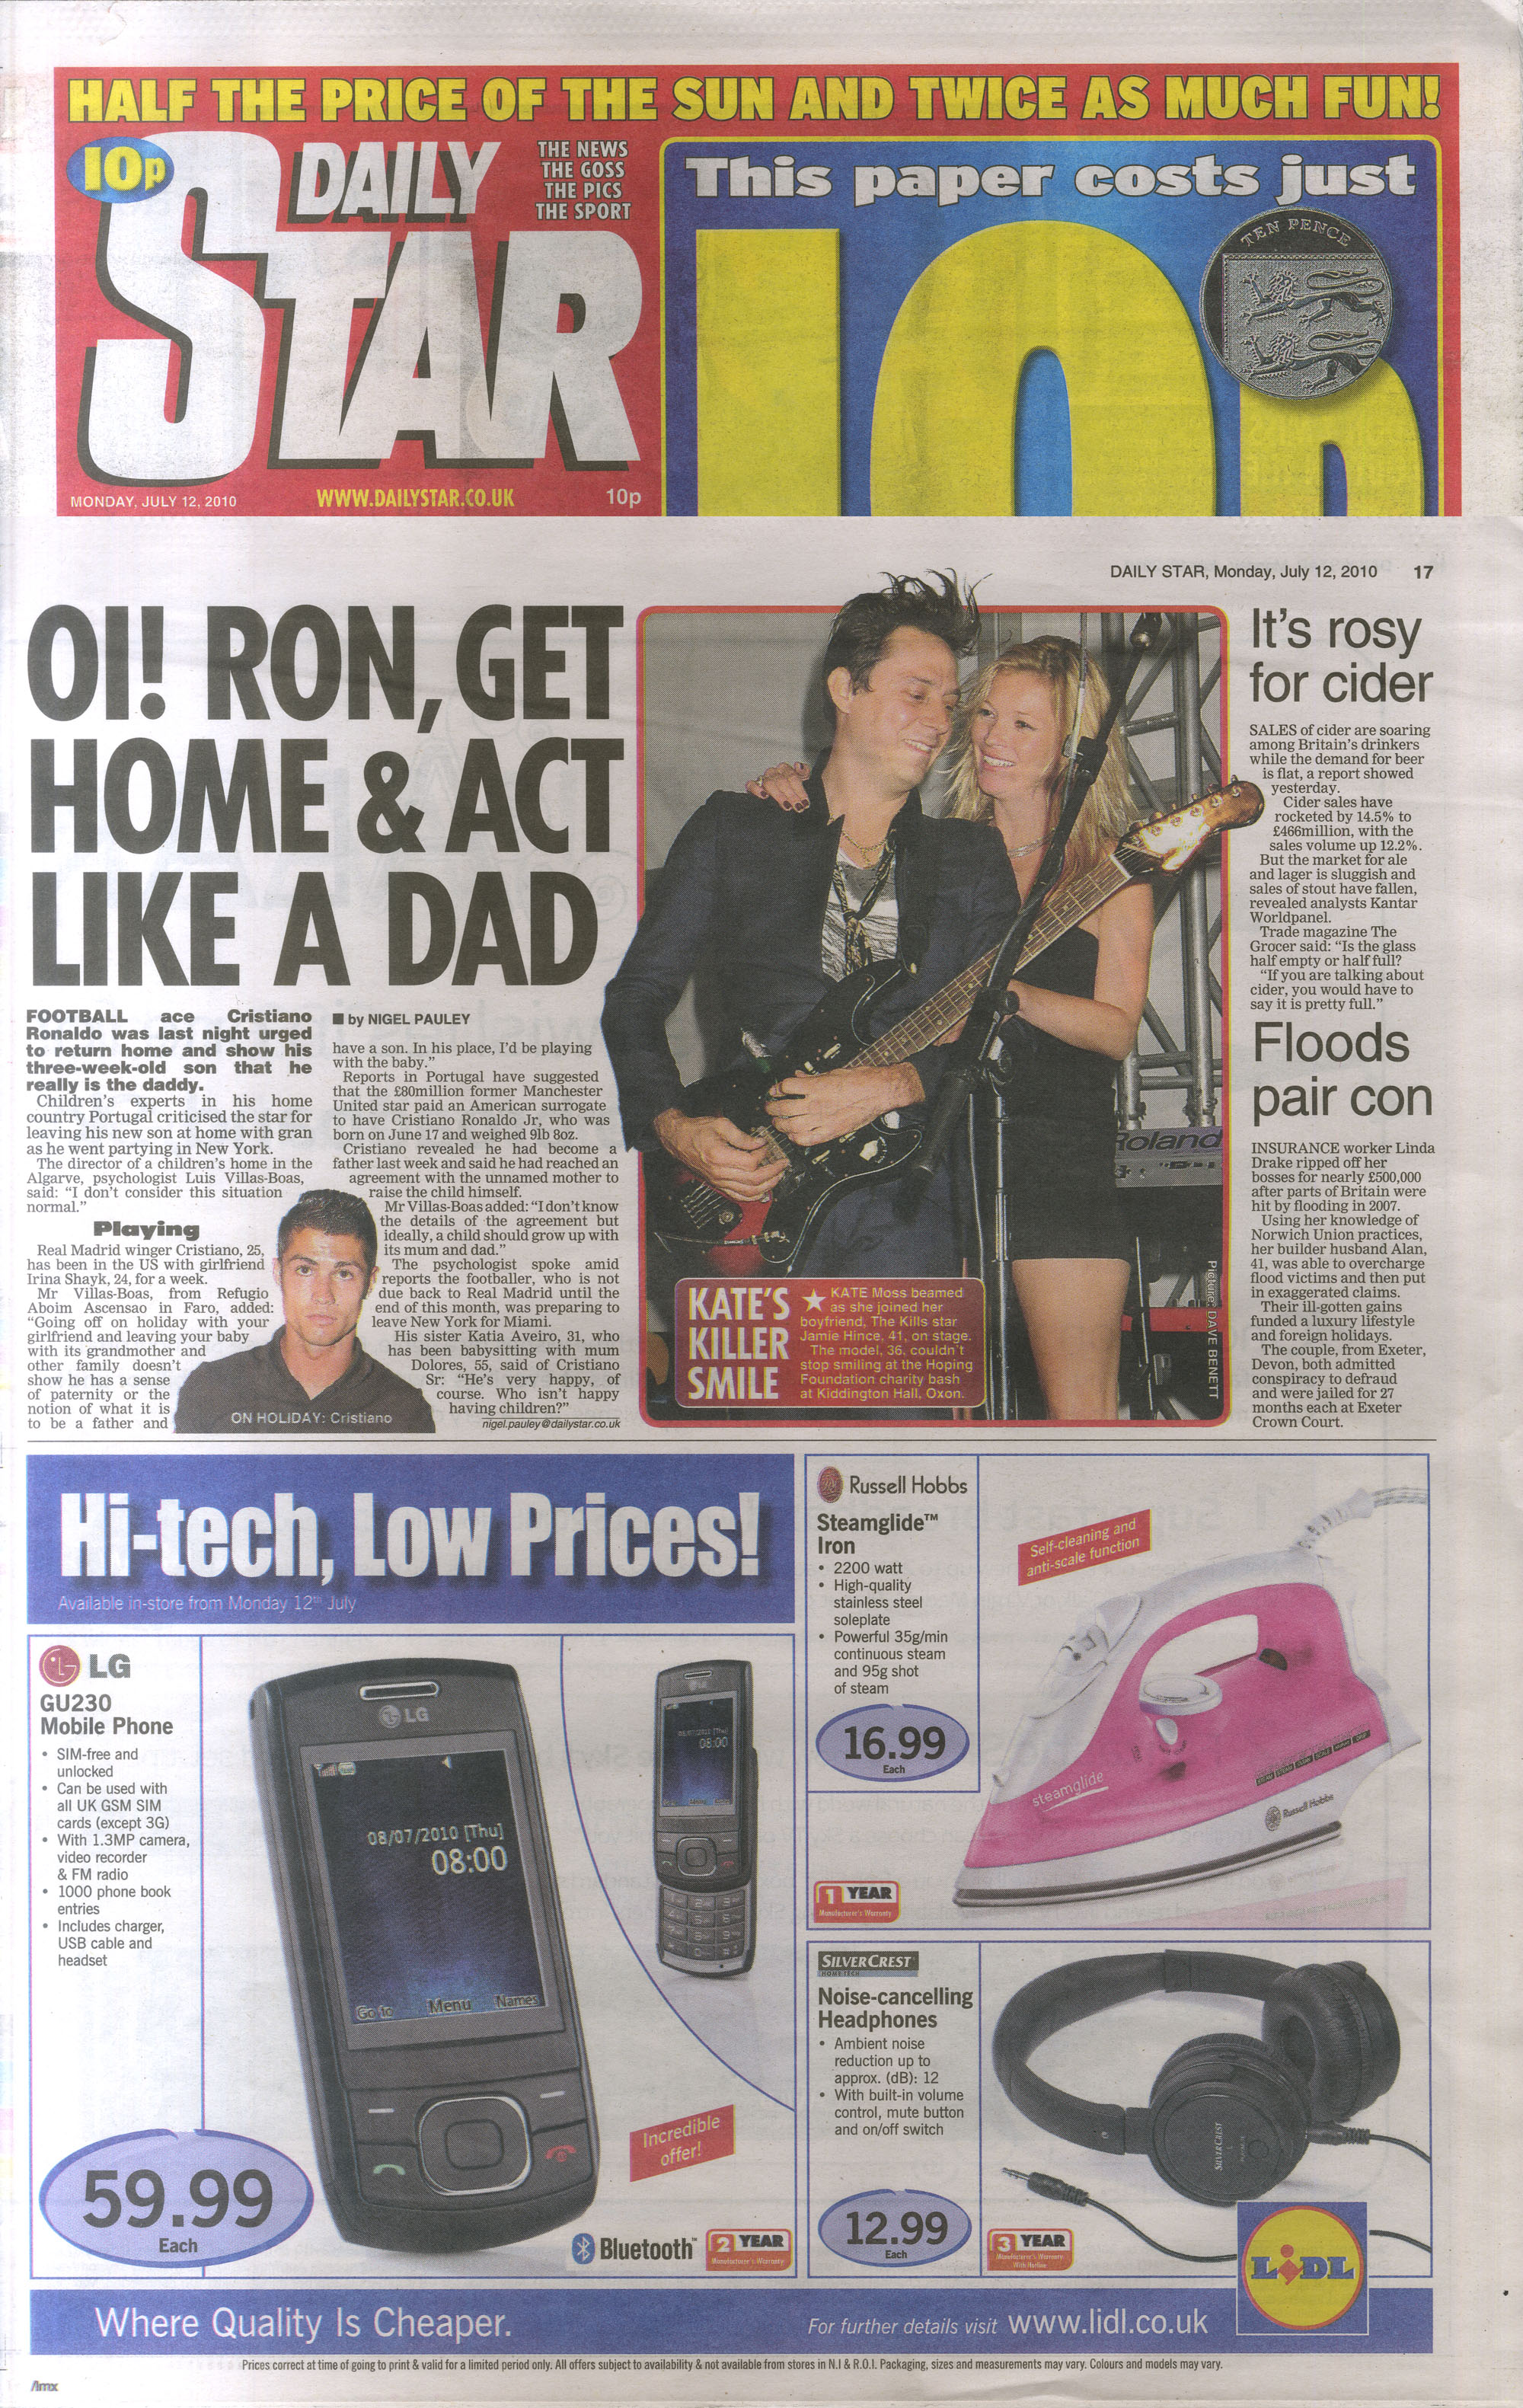 Daily Star editorial 12 July 2010 .jpg